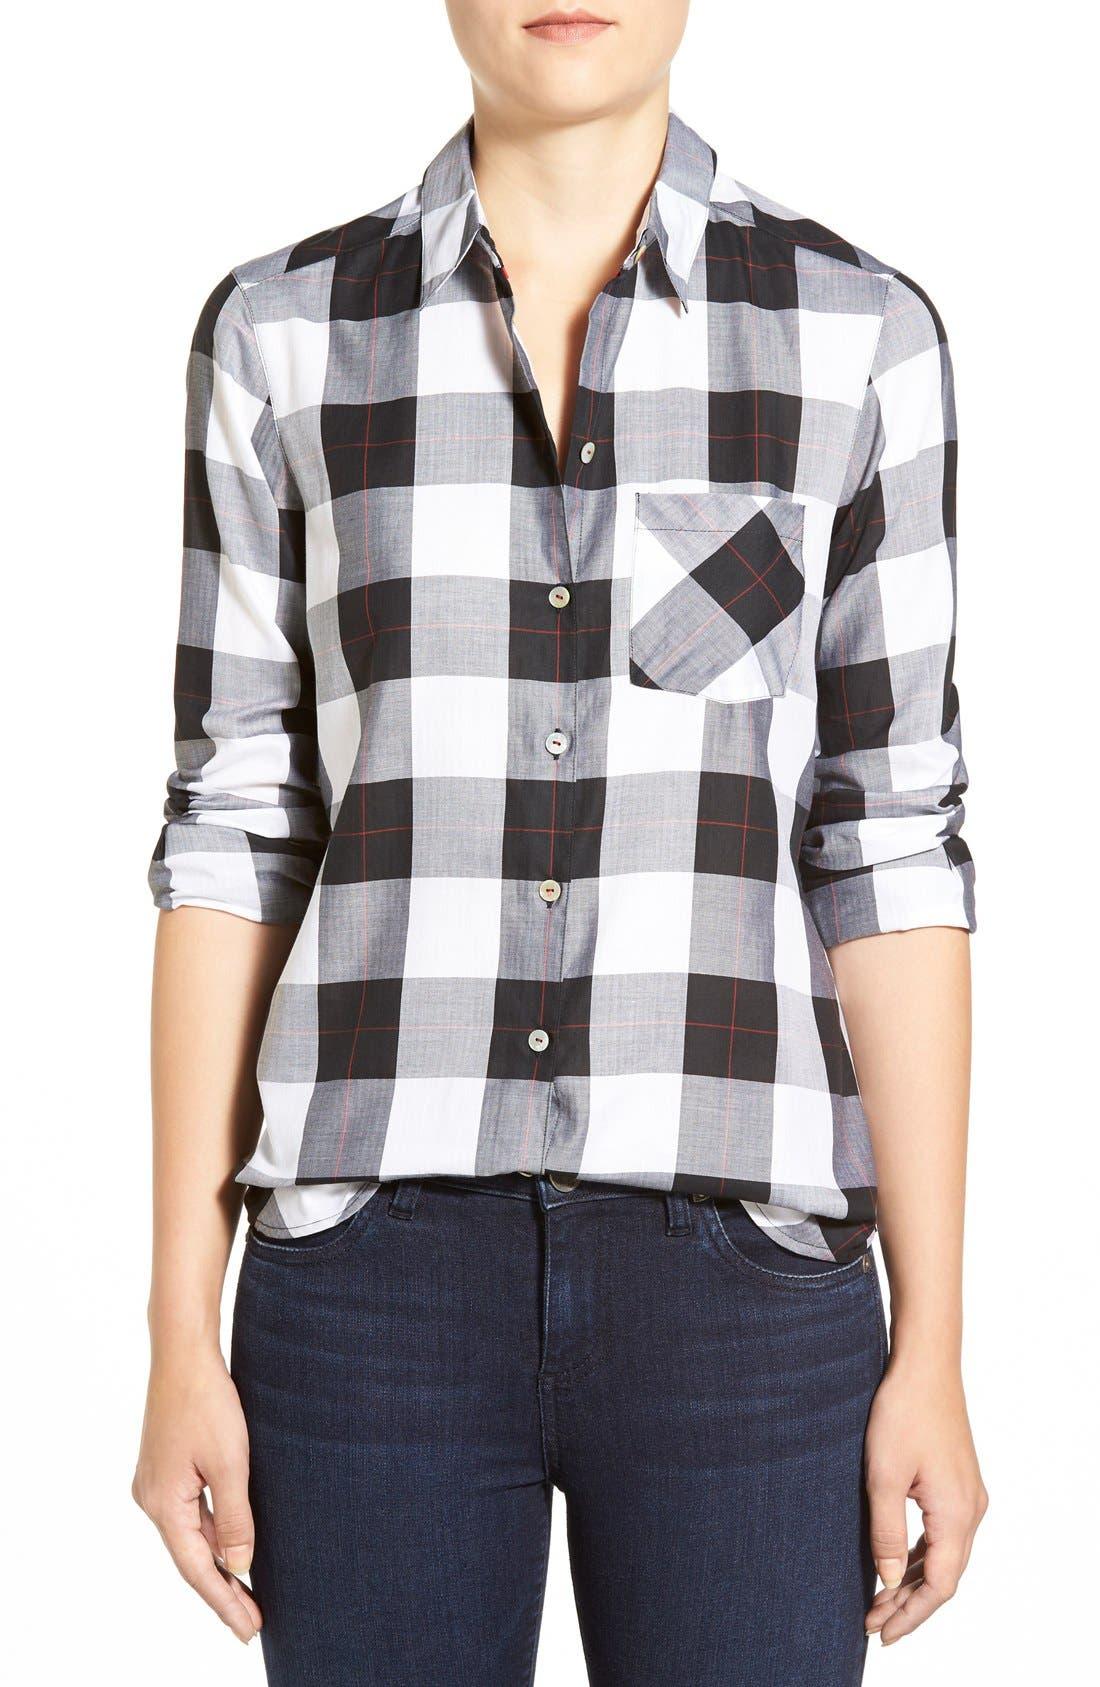 Main Image - Foxcroft Herringbone Buffalo Check Shirt (Regular & Petite)